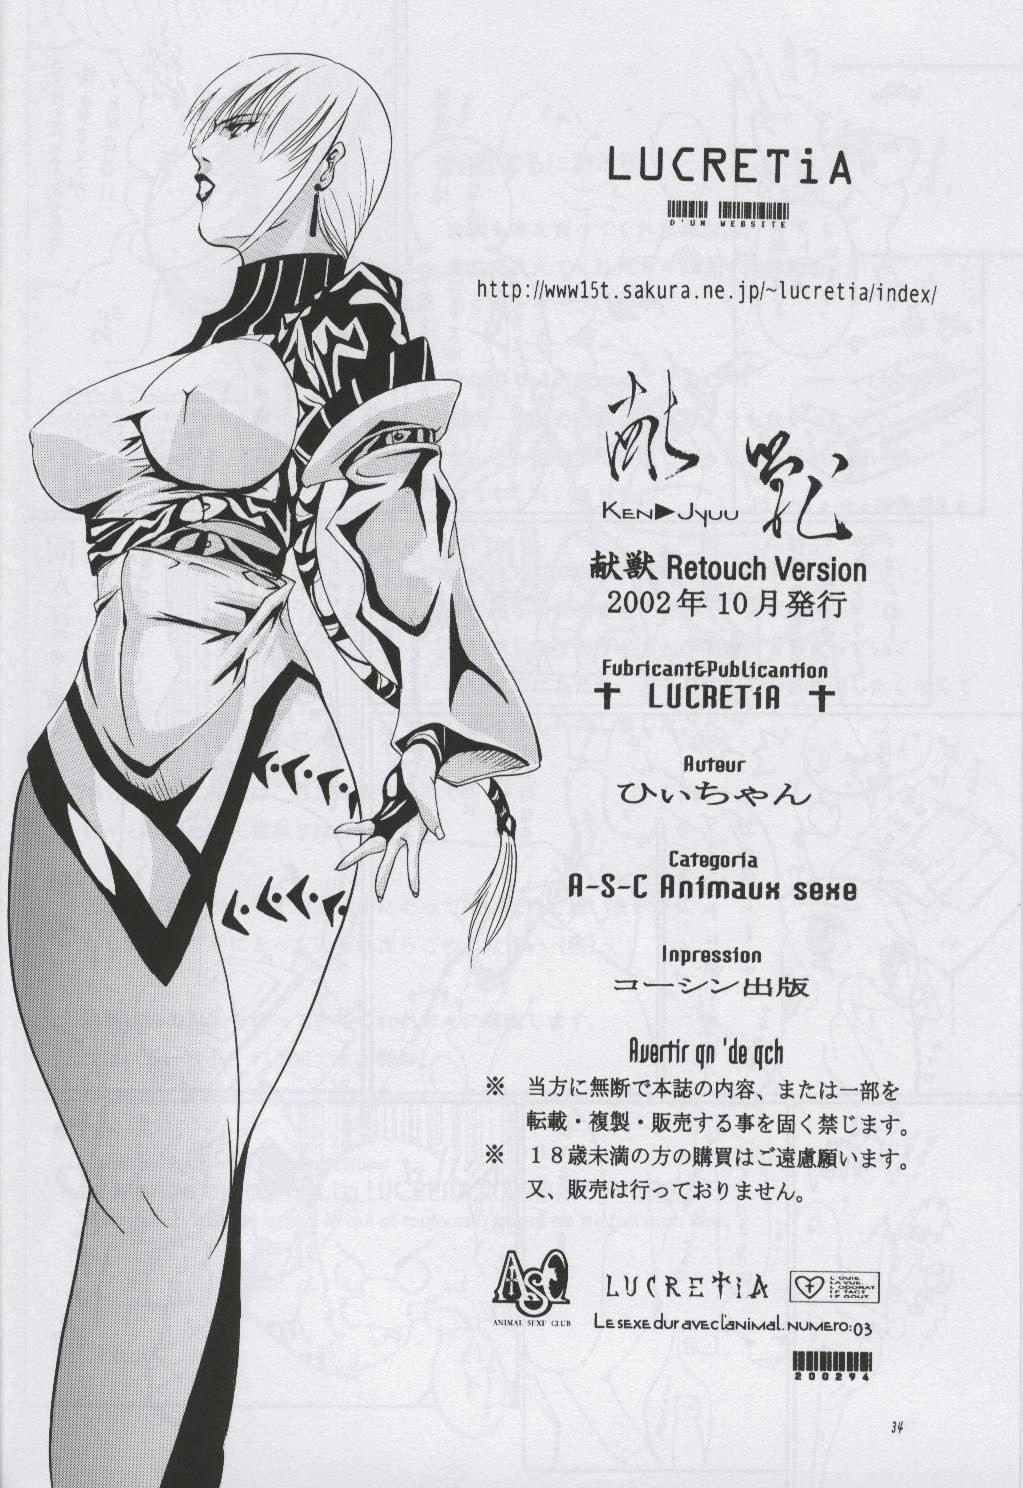 [LUCRETiA (Hiichan)] Ken-Jyuu Retouch Version - Le sexe dur avec l'animal. numero:03 (Samurai Spirits) 31